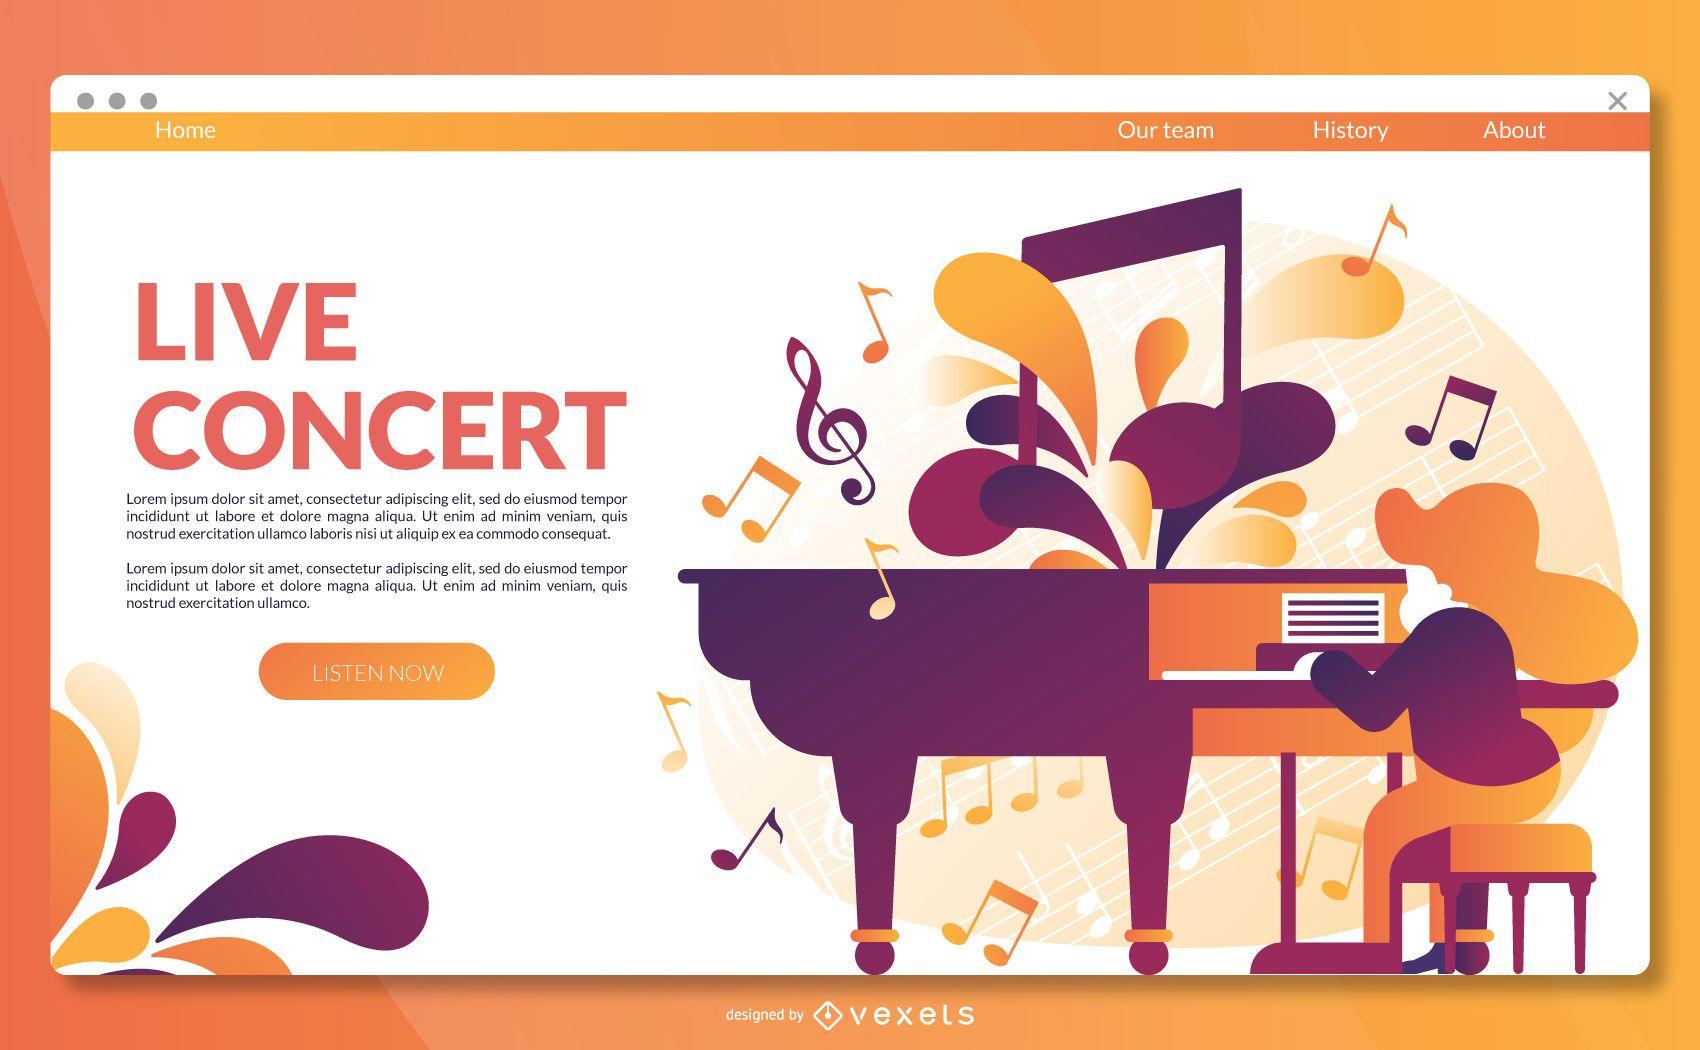 Live concert landing page template